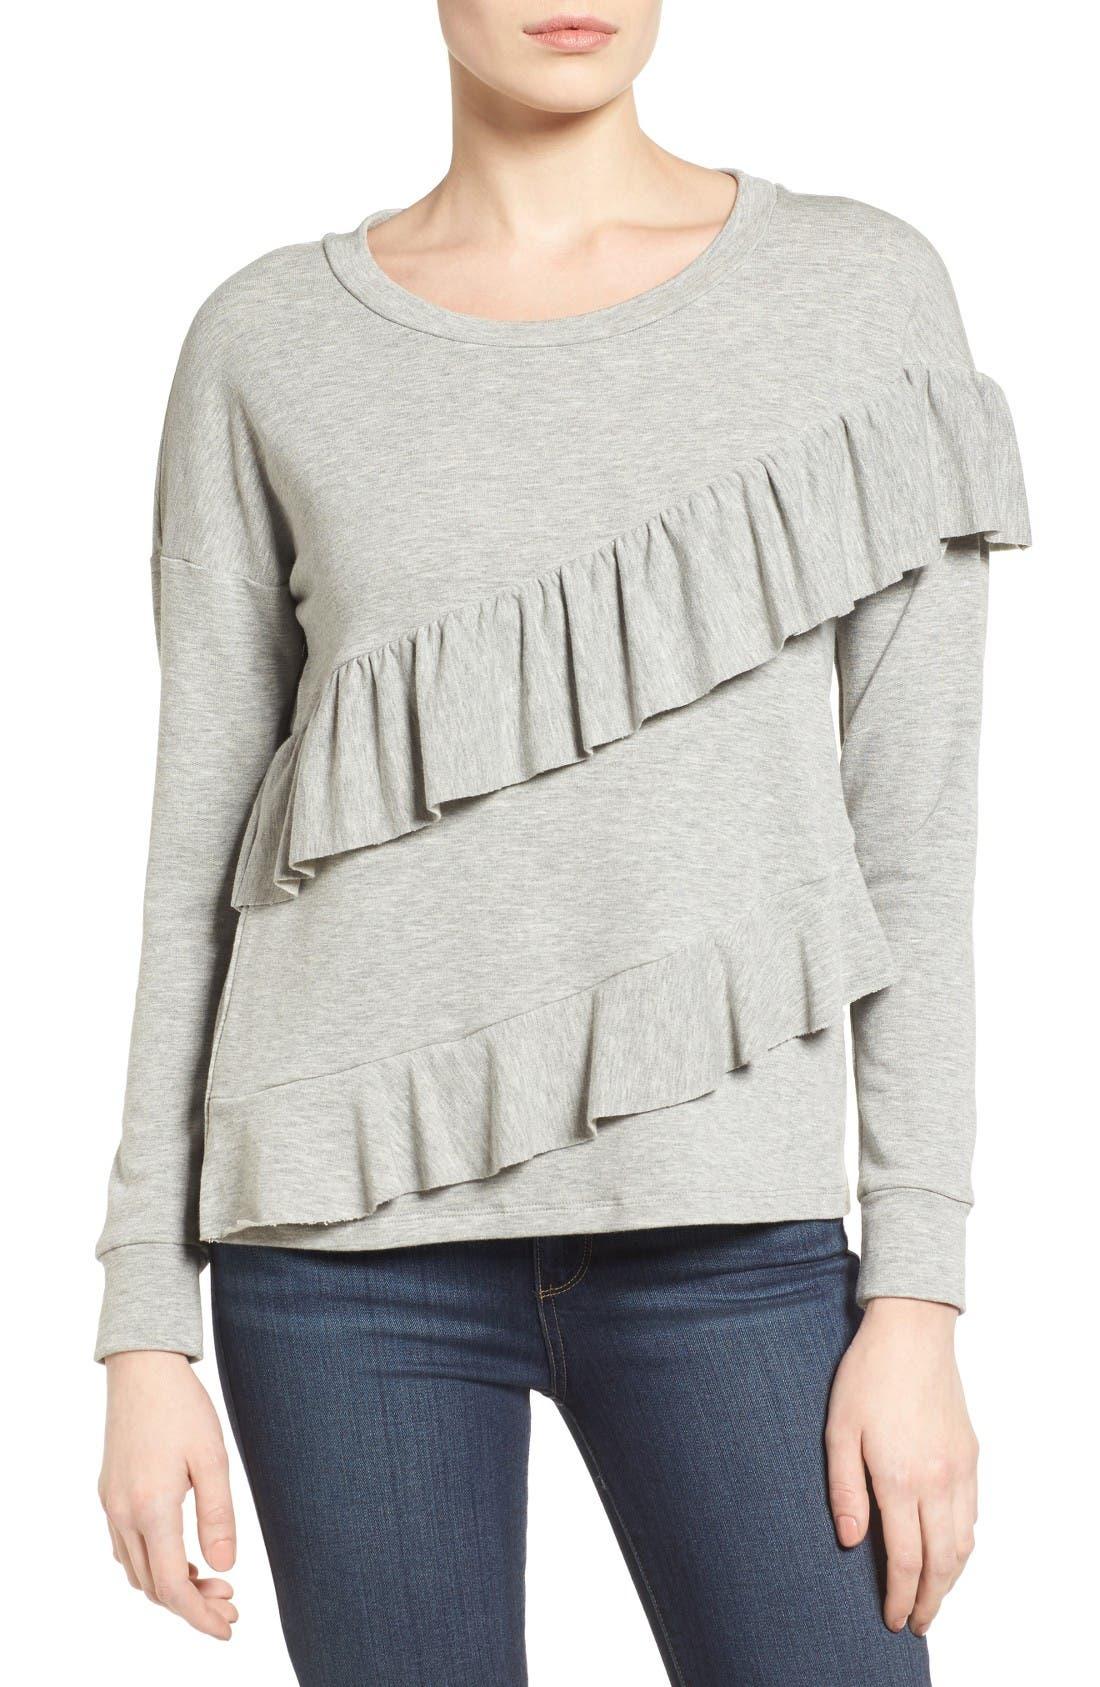 Alternate Image 1 Selected - Pleione French Terry Ruffle Sweatshirt (Regular & Petite)